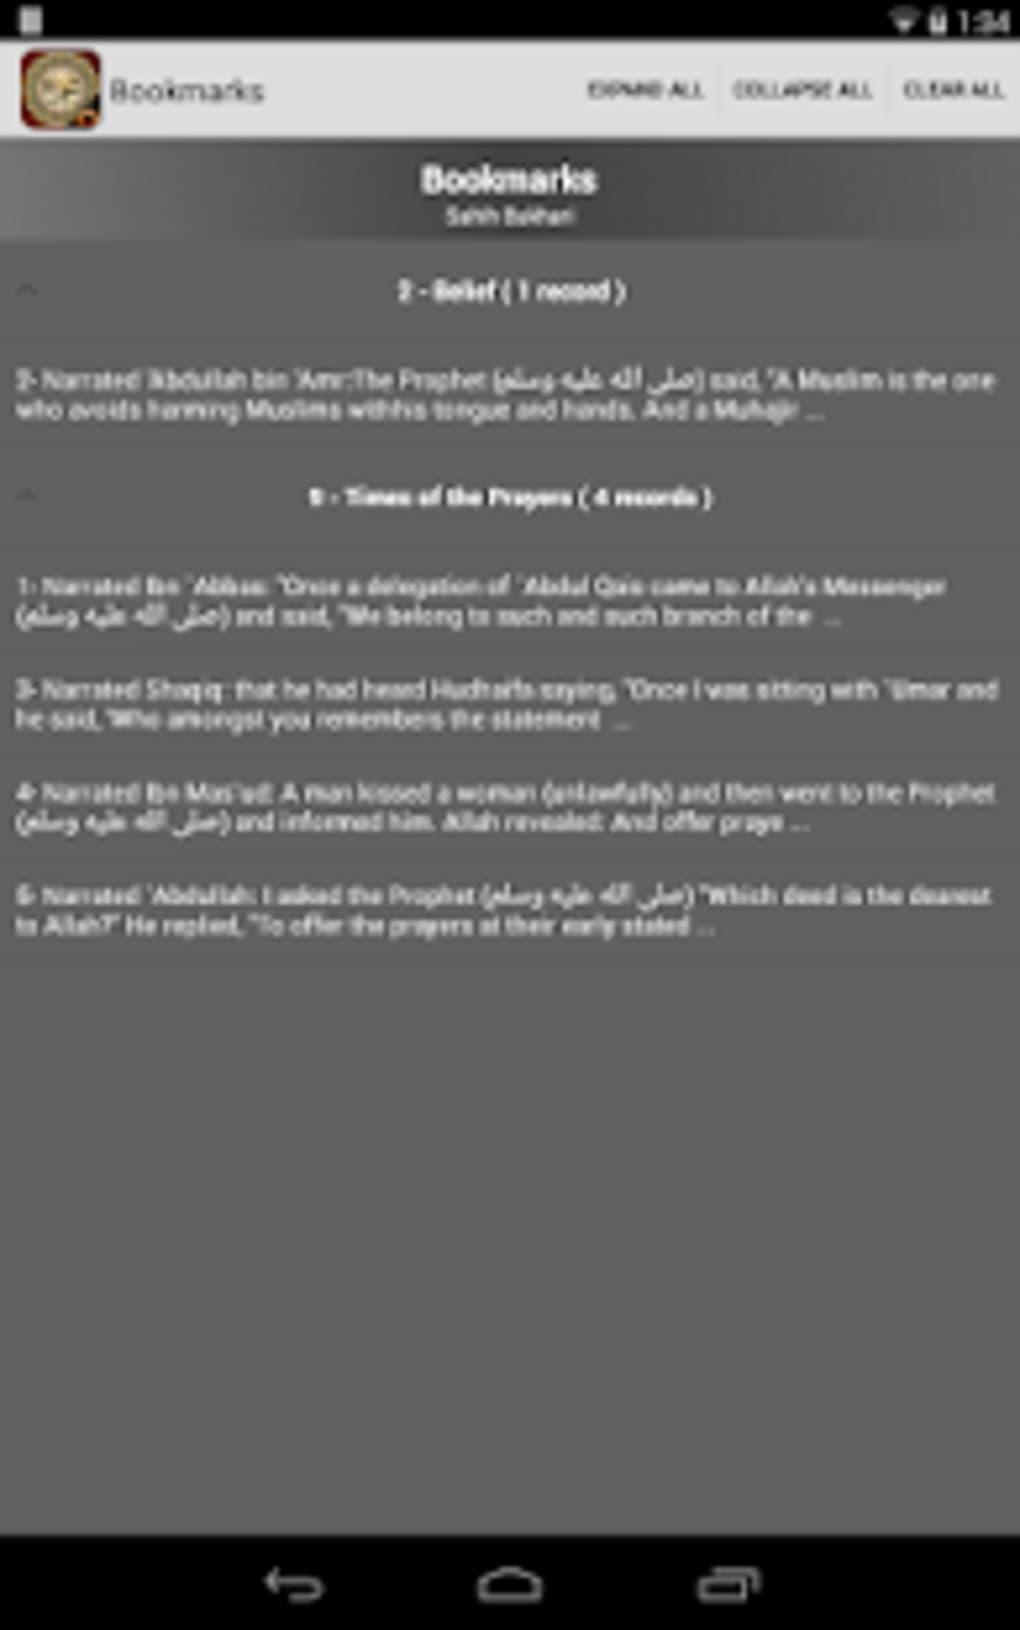 hadith-collection-pro-sahih-bukhari-muslim en softonic com